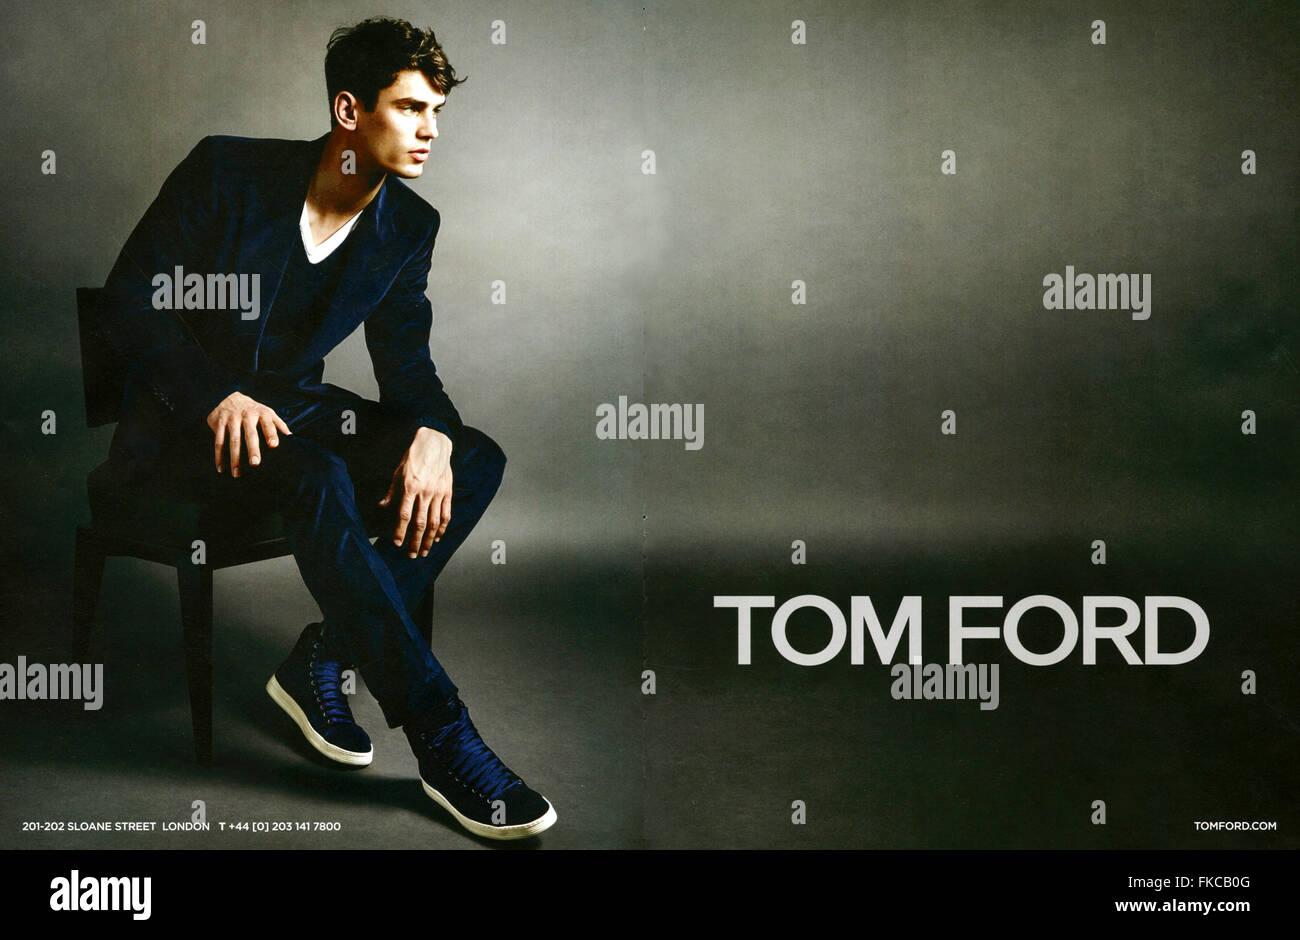 2010s UK Tom Ford Magazine Advert - Stock Image